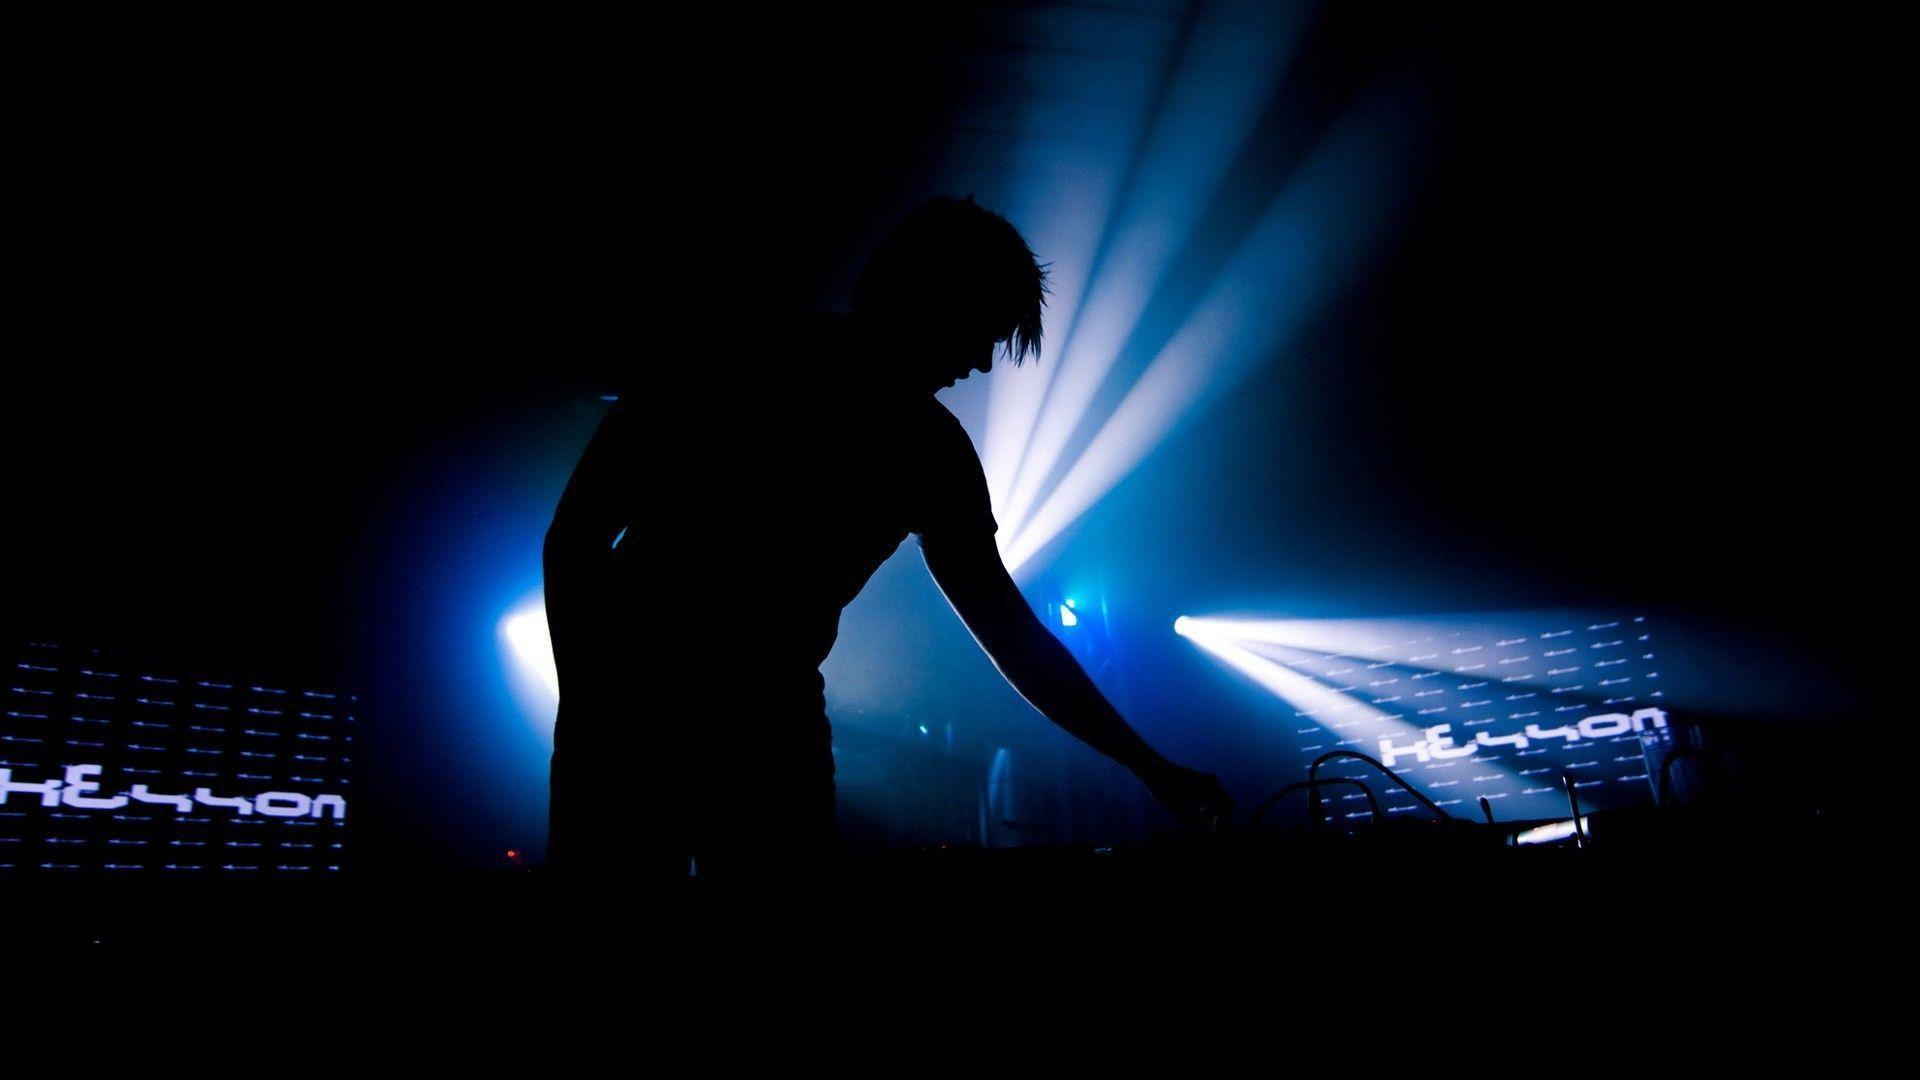 DJ Music Wallpapers - Wallpaper Cave